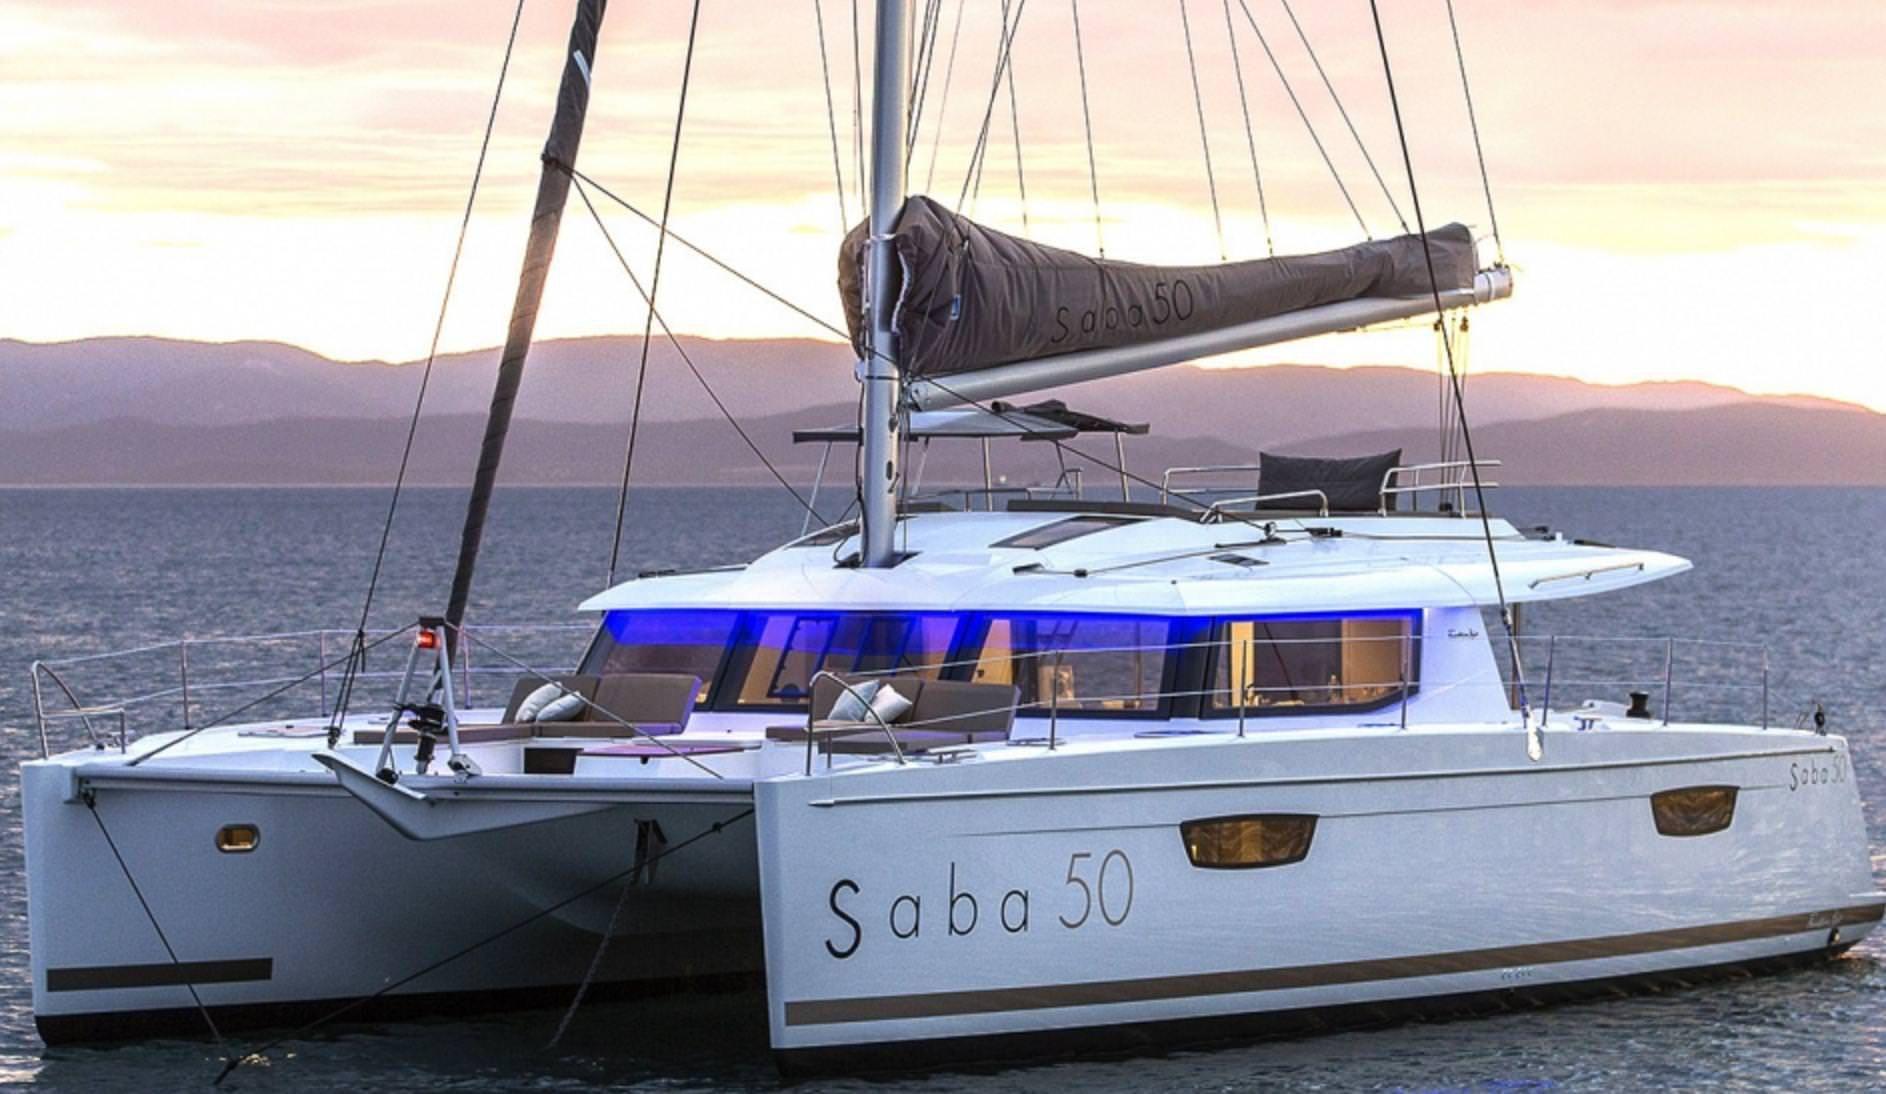 MARIANN - Fountaine Pajot Saba 50 - 3 Cabins - St Thomas - St John - Virgin Gorda - Tortola: